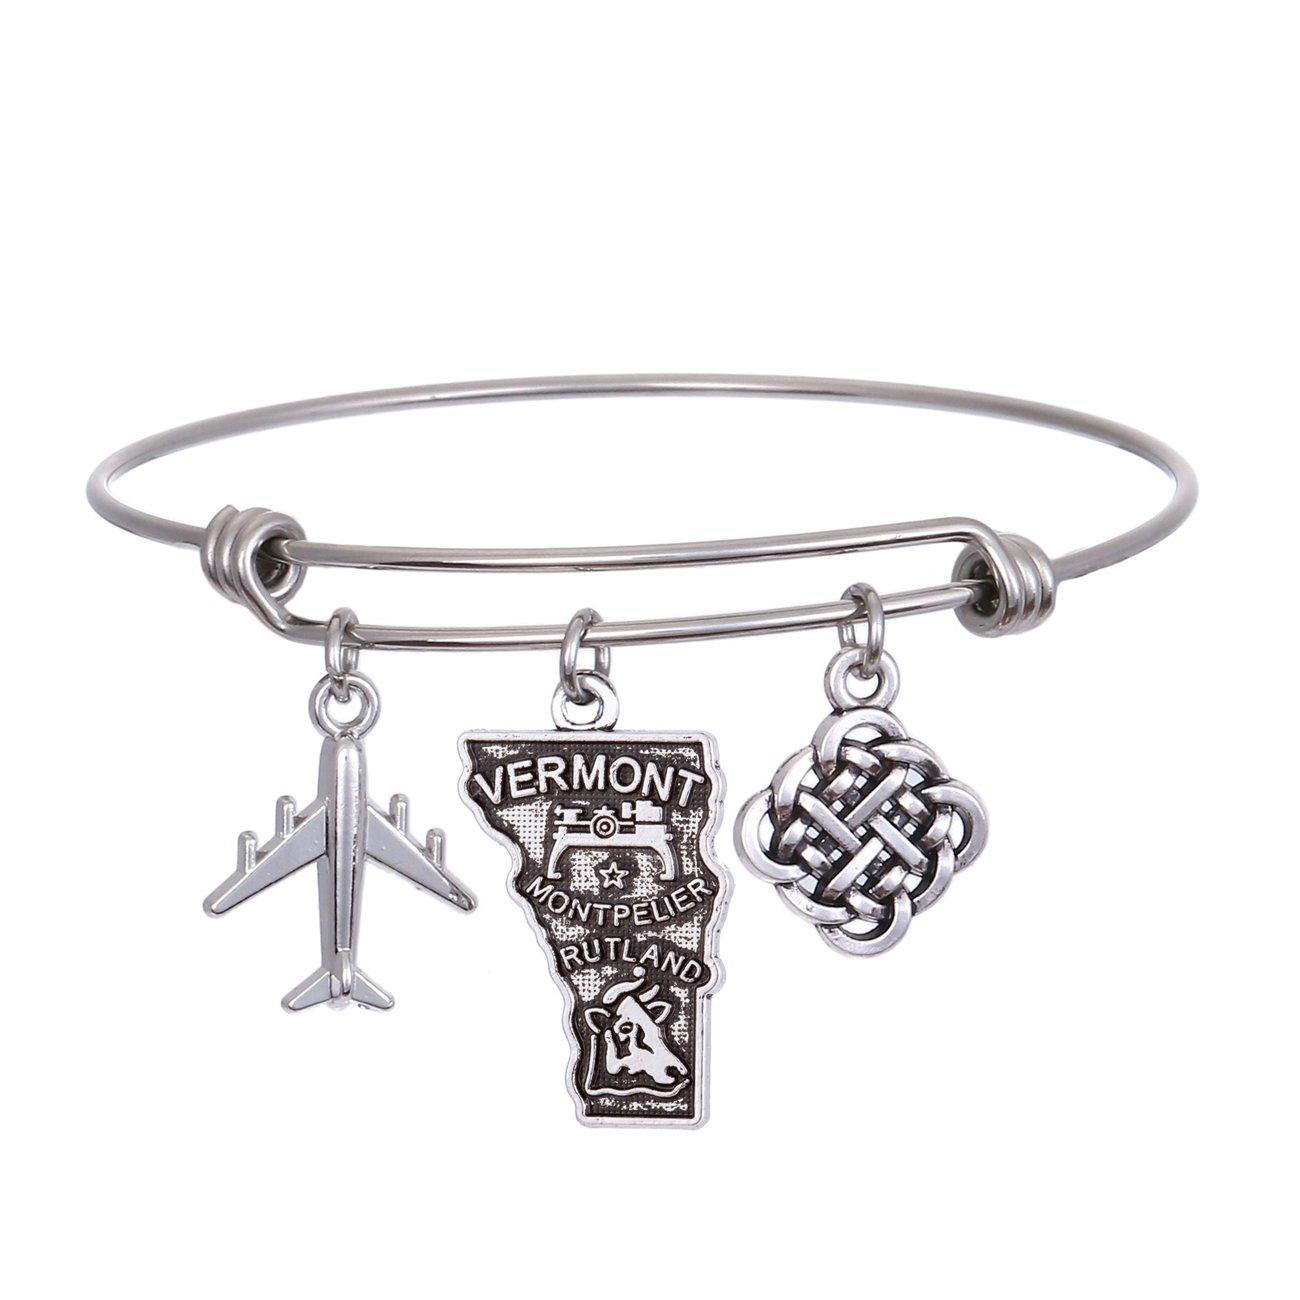 JJTZX State Bangle U.S. Map Charm Expandable Travel Bracelet Long Distance Relationship Gift Best Friends Bracelet (Vermont)